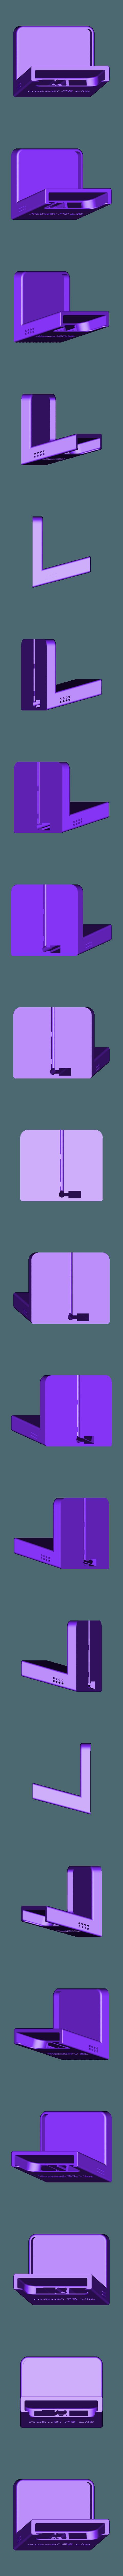 Dock.stl Download free STL file Huawei P8 Lite 2017 Dock Phone • 3D printable object, Alcom76